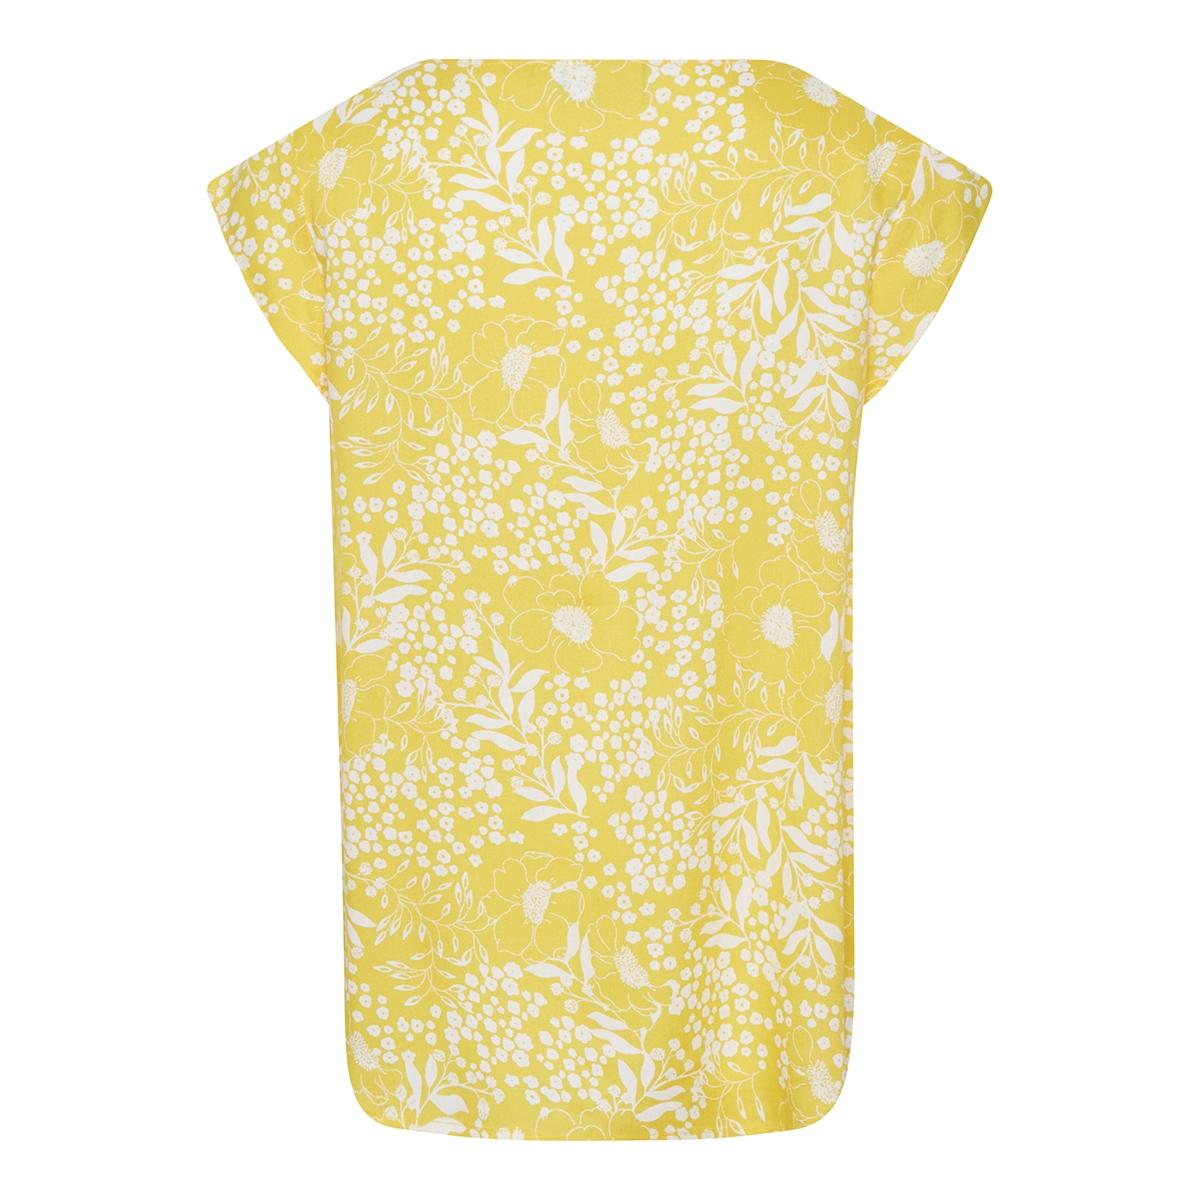 tishasz adele ss top 30510249 saint tropez t-shirt 600003